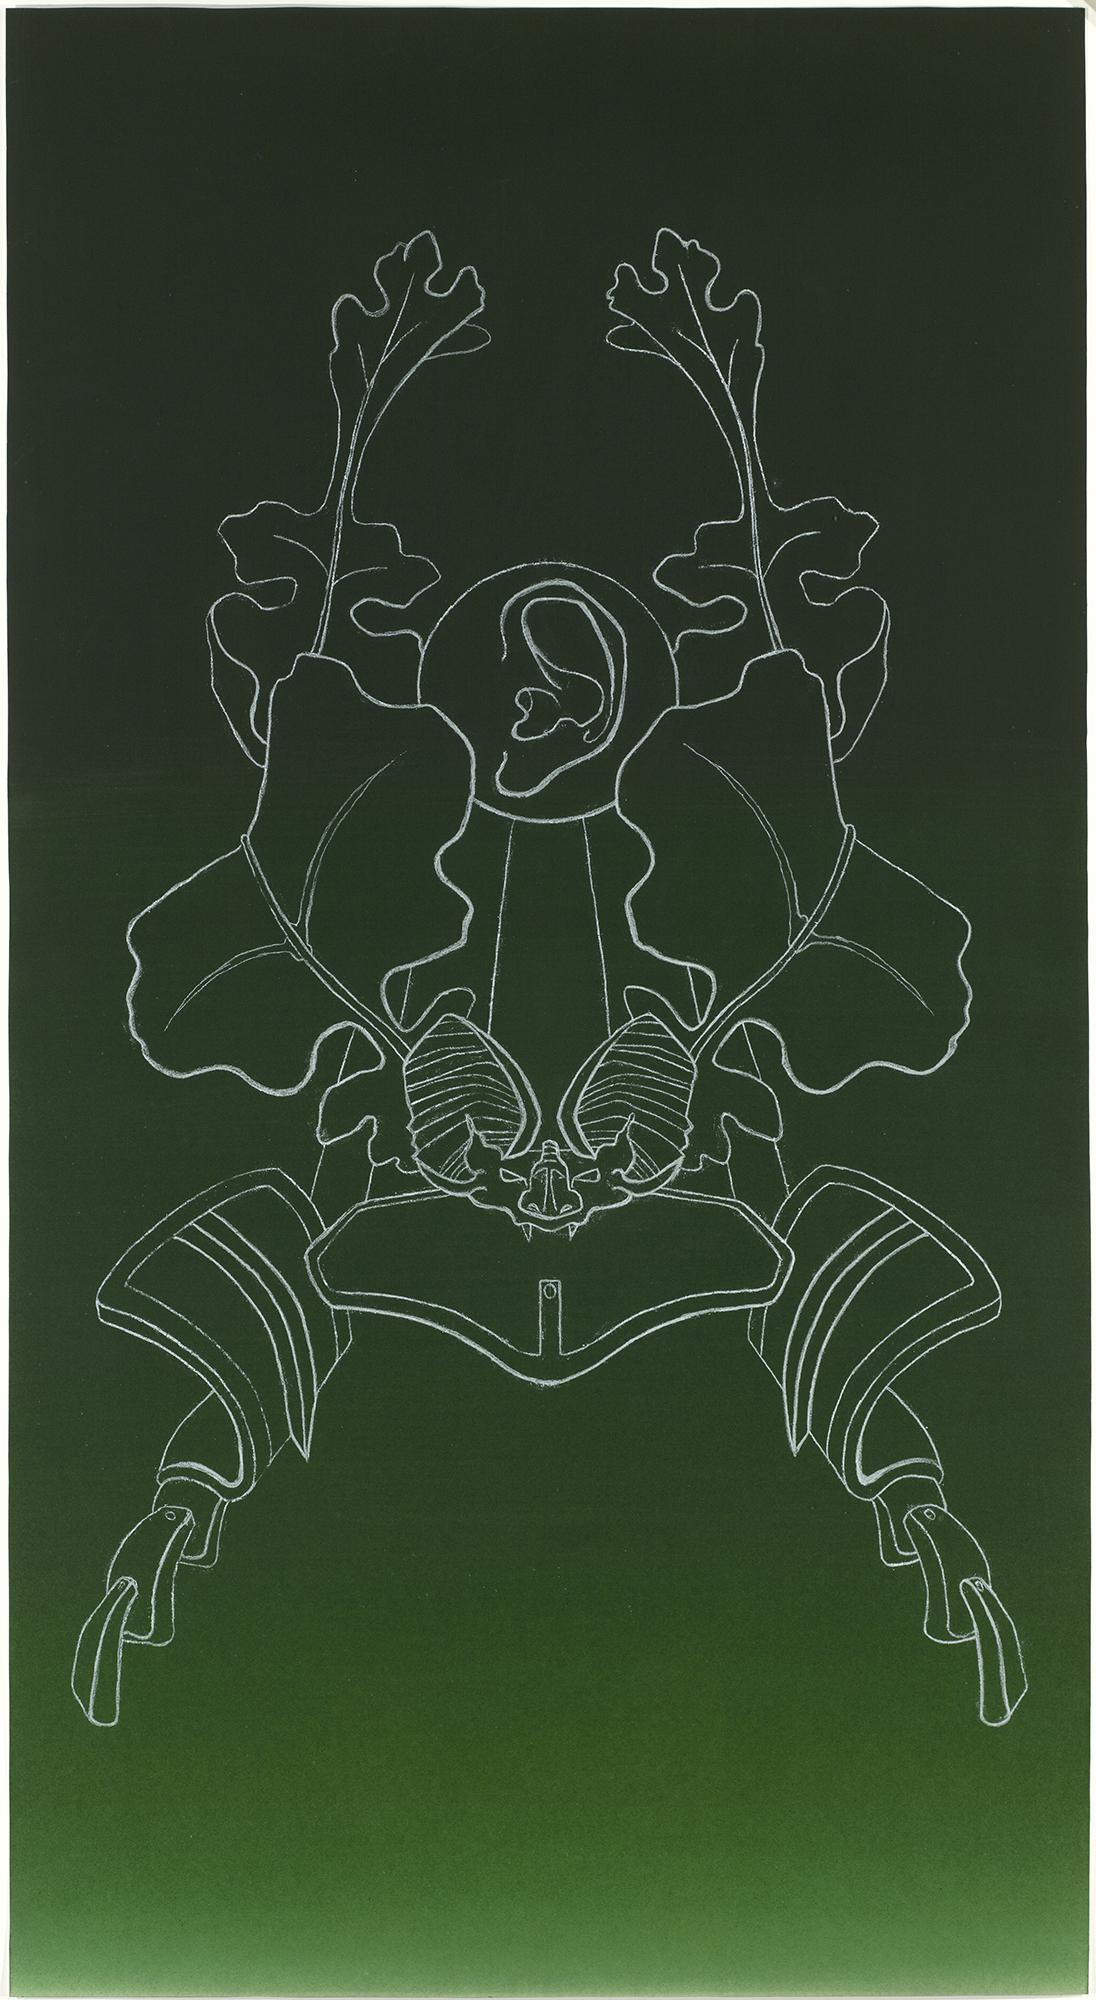 Samurai Helmet #11, 1990